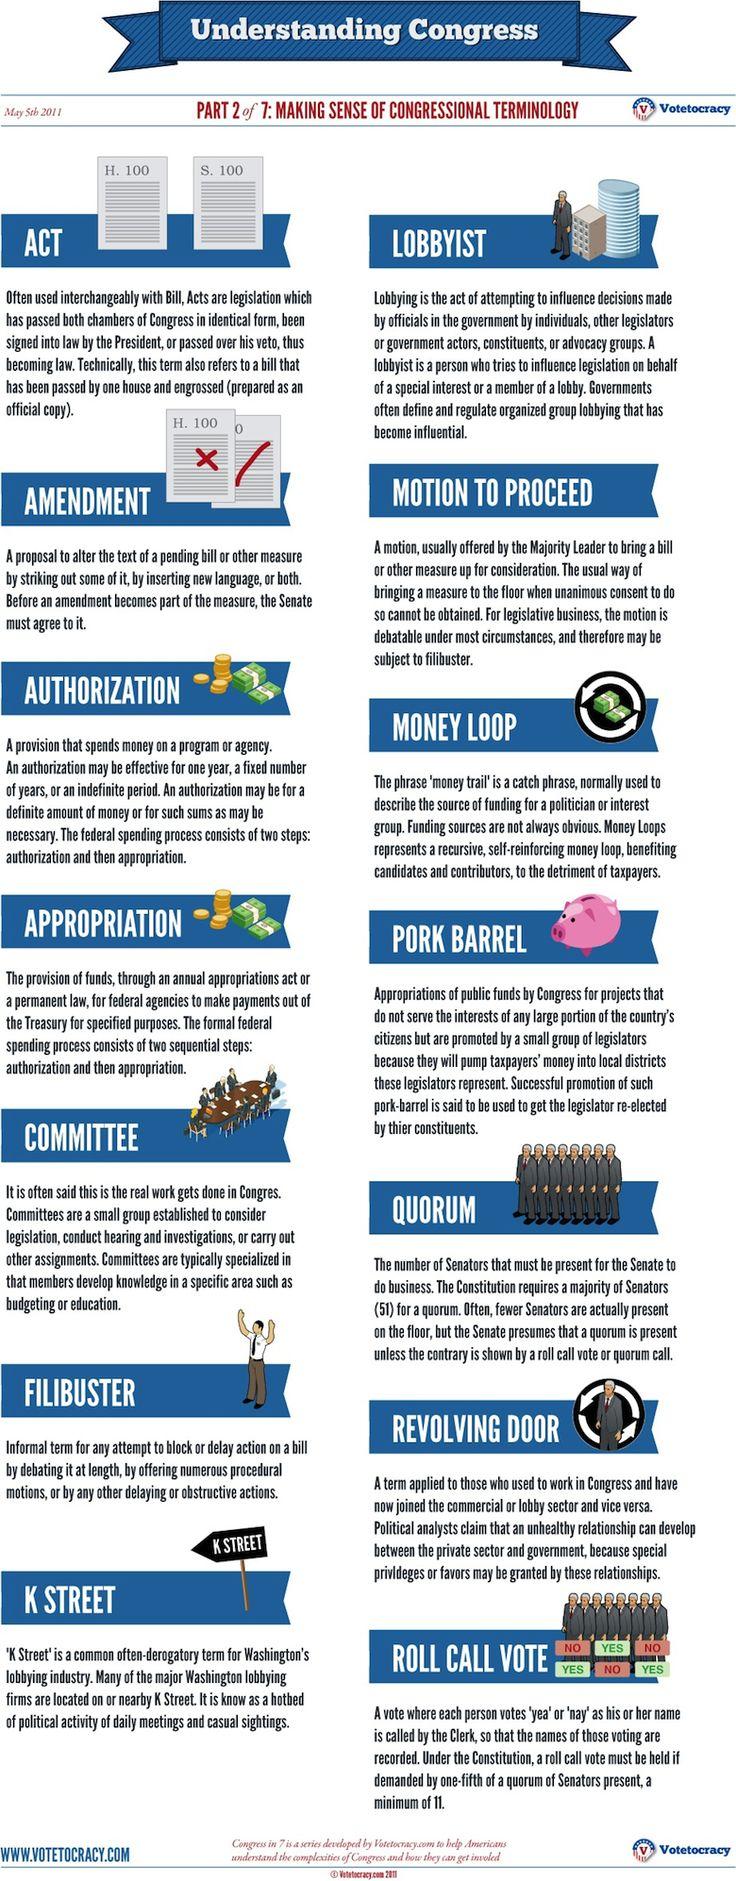 Understanding Congress Part 2 of 7: Making sense of Congressional Terminology